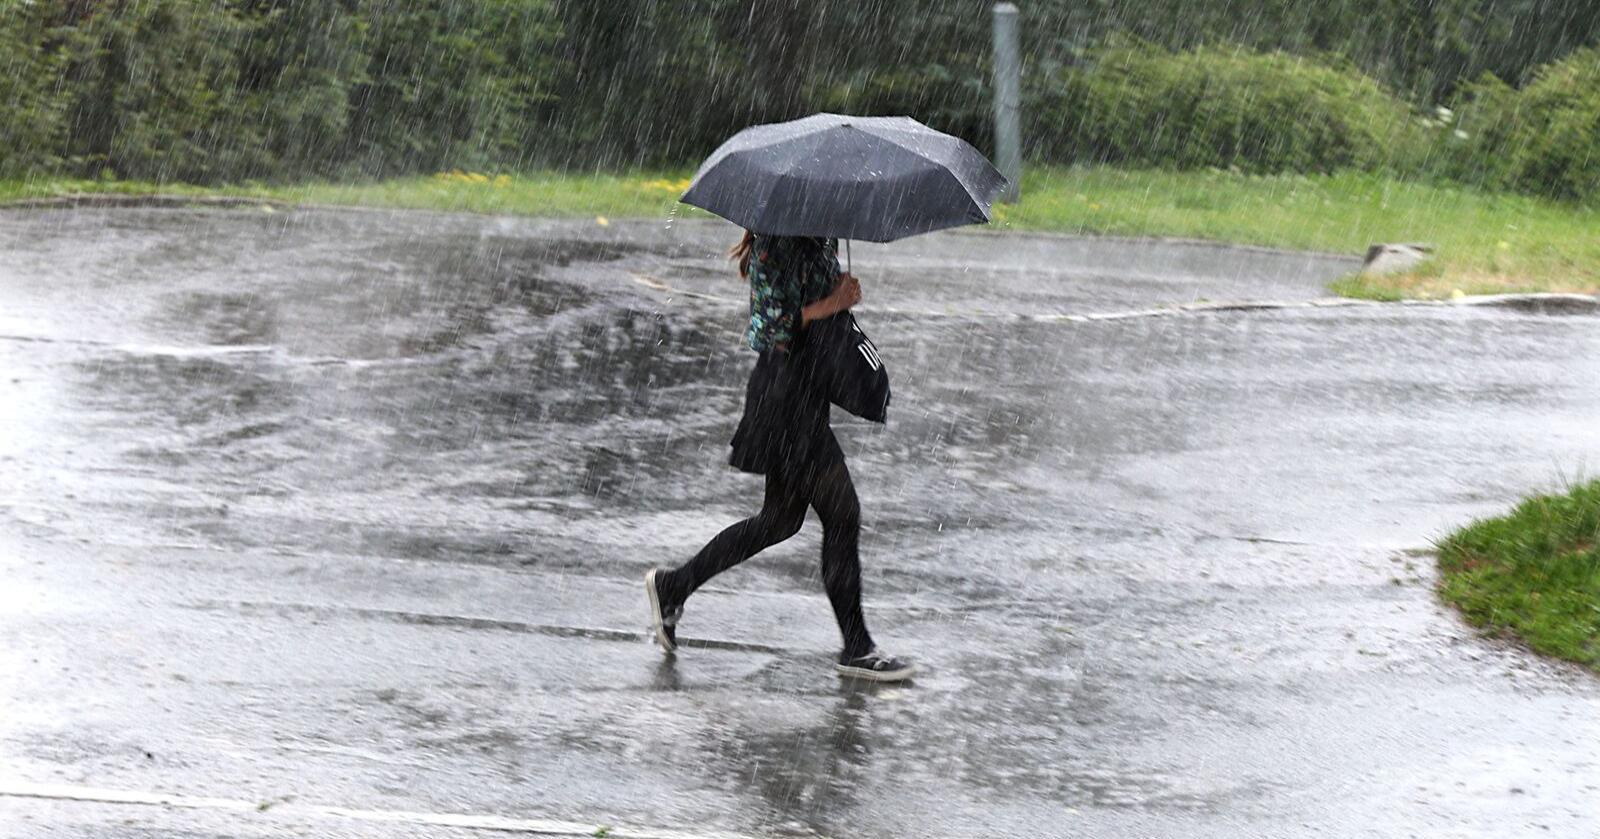 I juli og august i fjor førte kraftige regnskurar til øydeleggingar for 136 millionar, viser forsikringsstal. Foto: Vidar Ruud / NTB / NPK